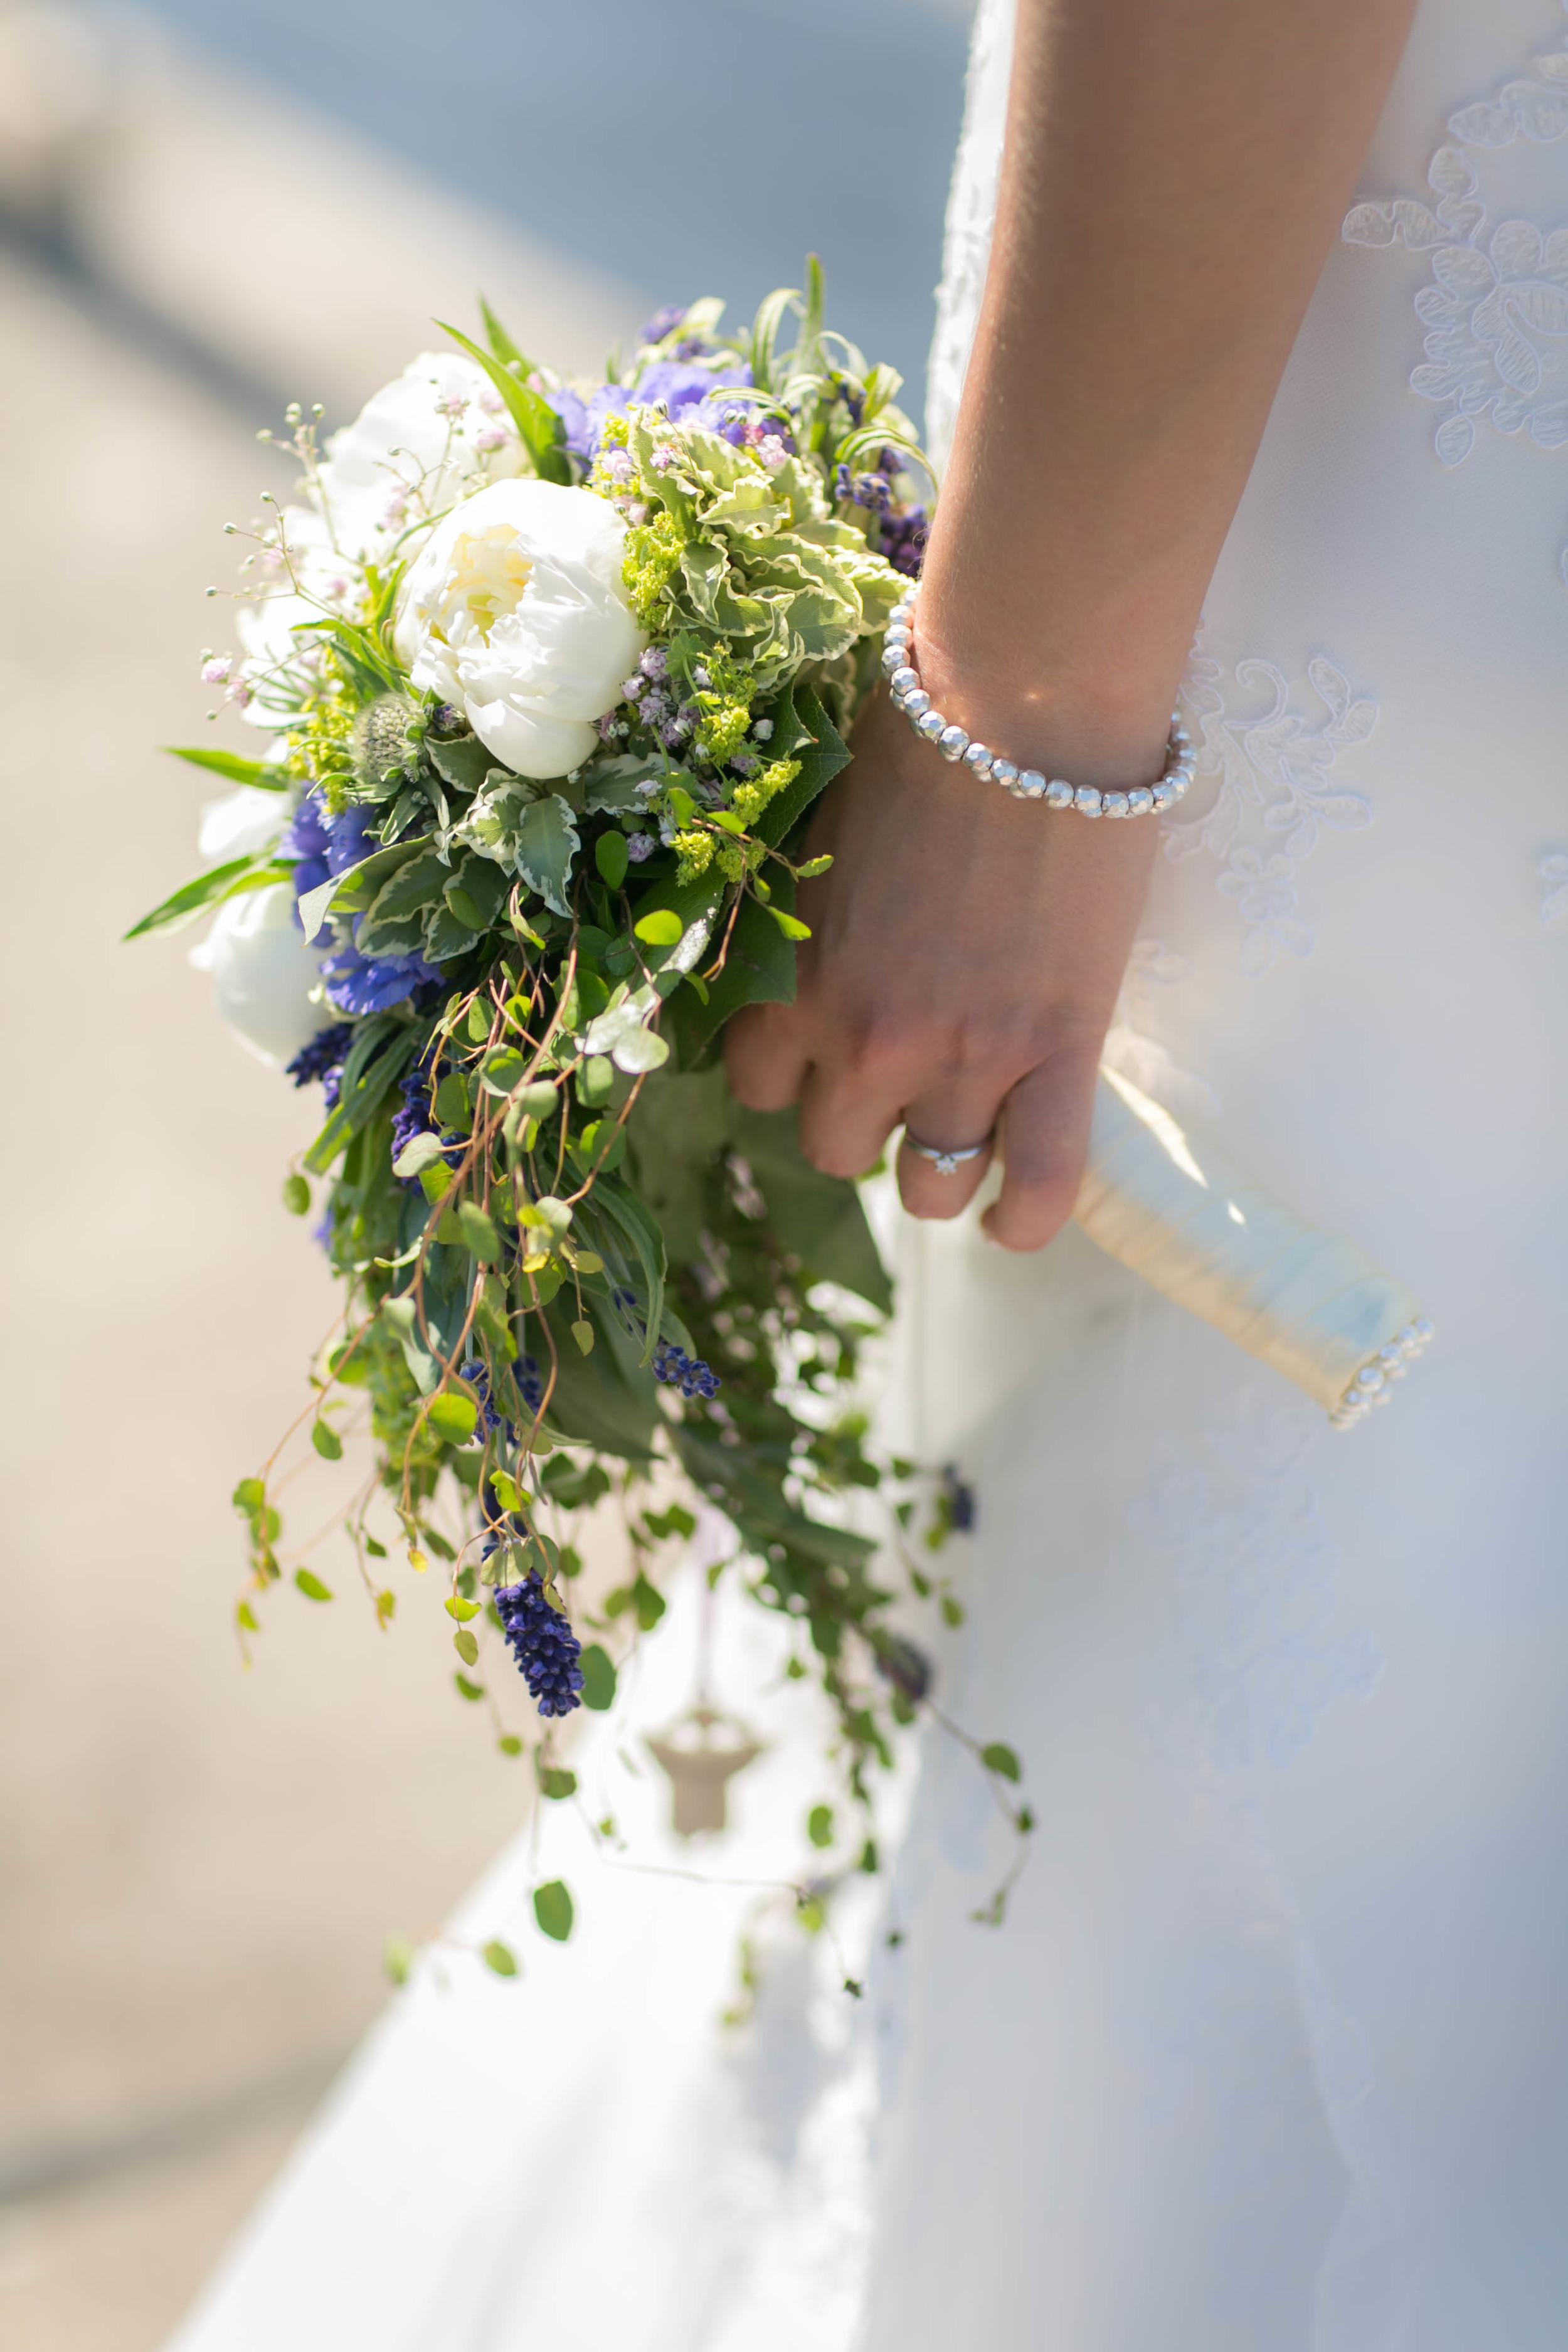 Hochzeitsfotografie Berlin_Fran Burrows Fotografie-249.jpg